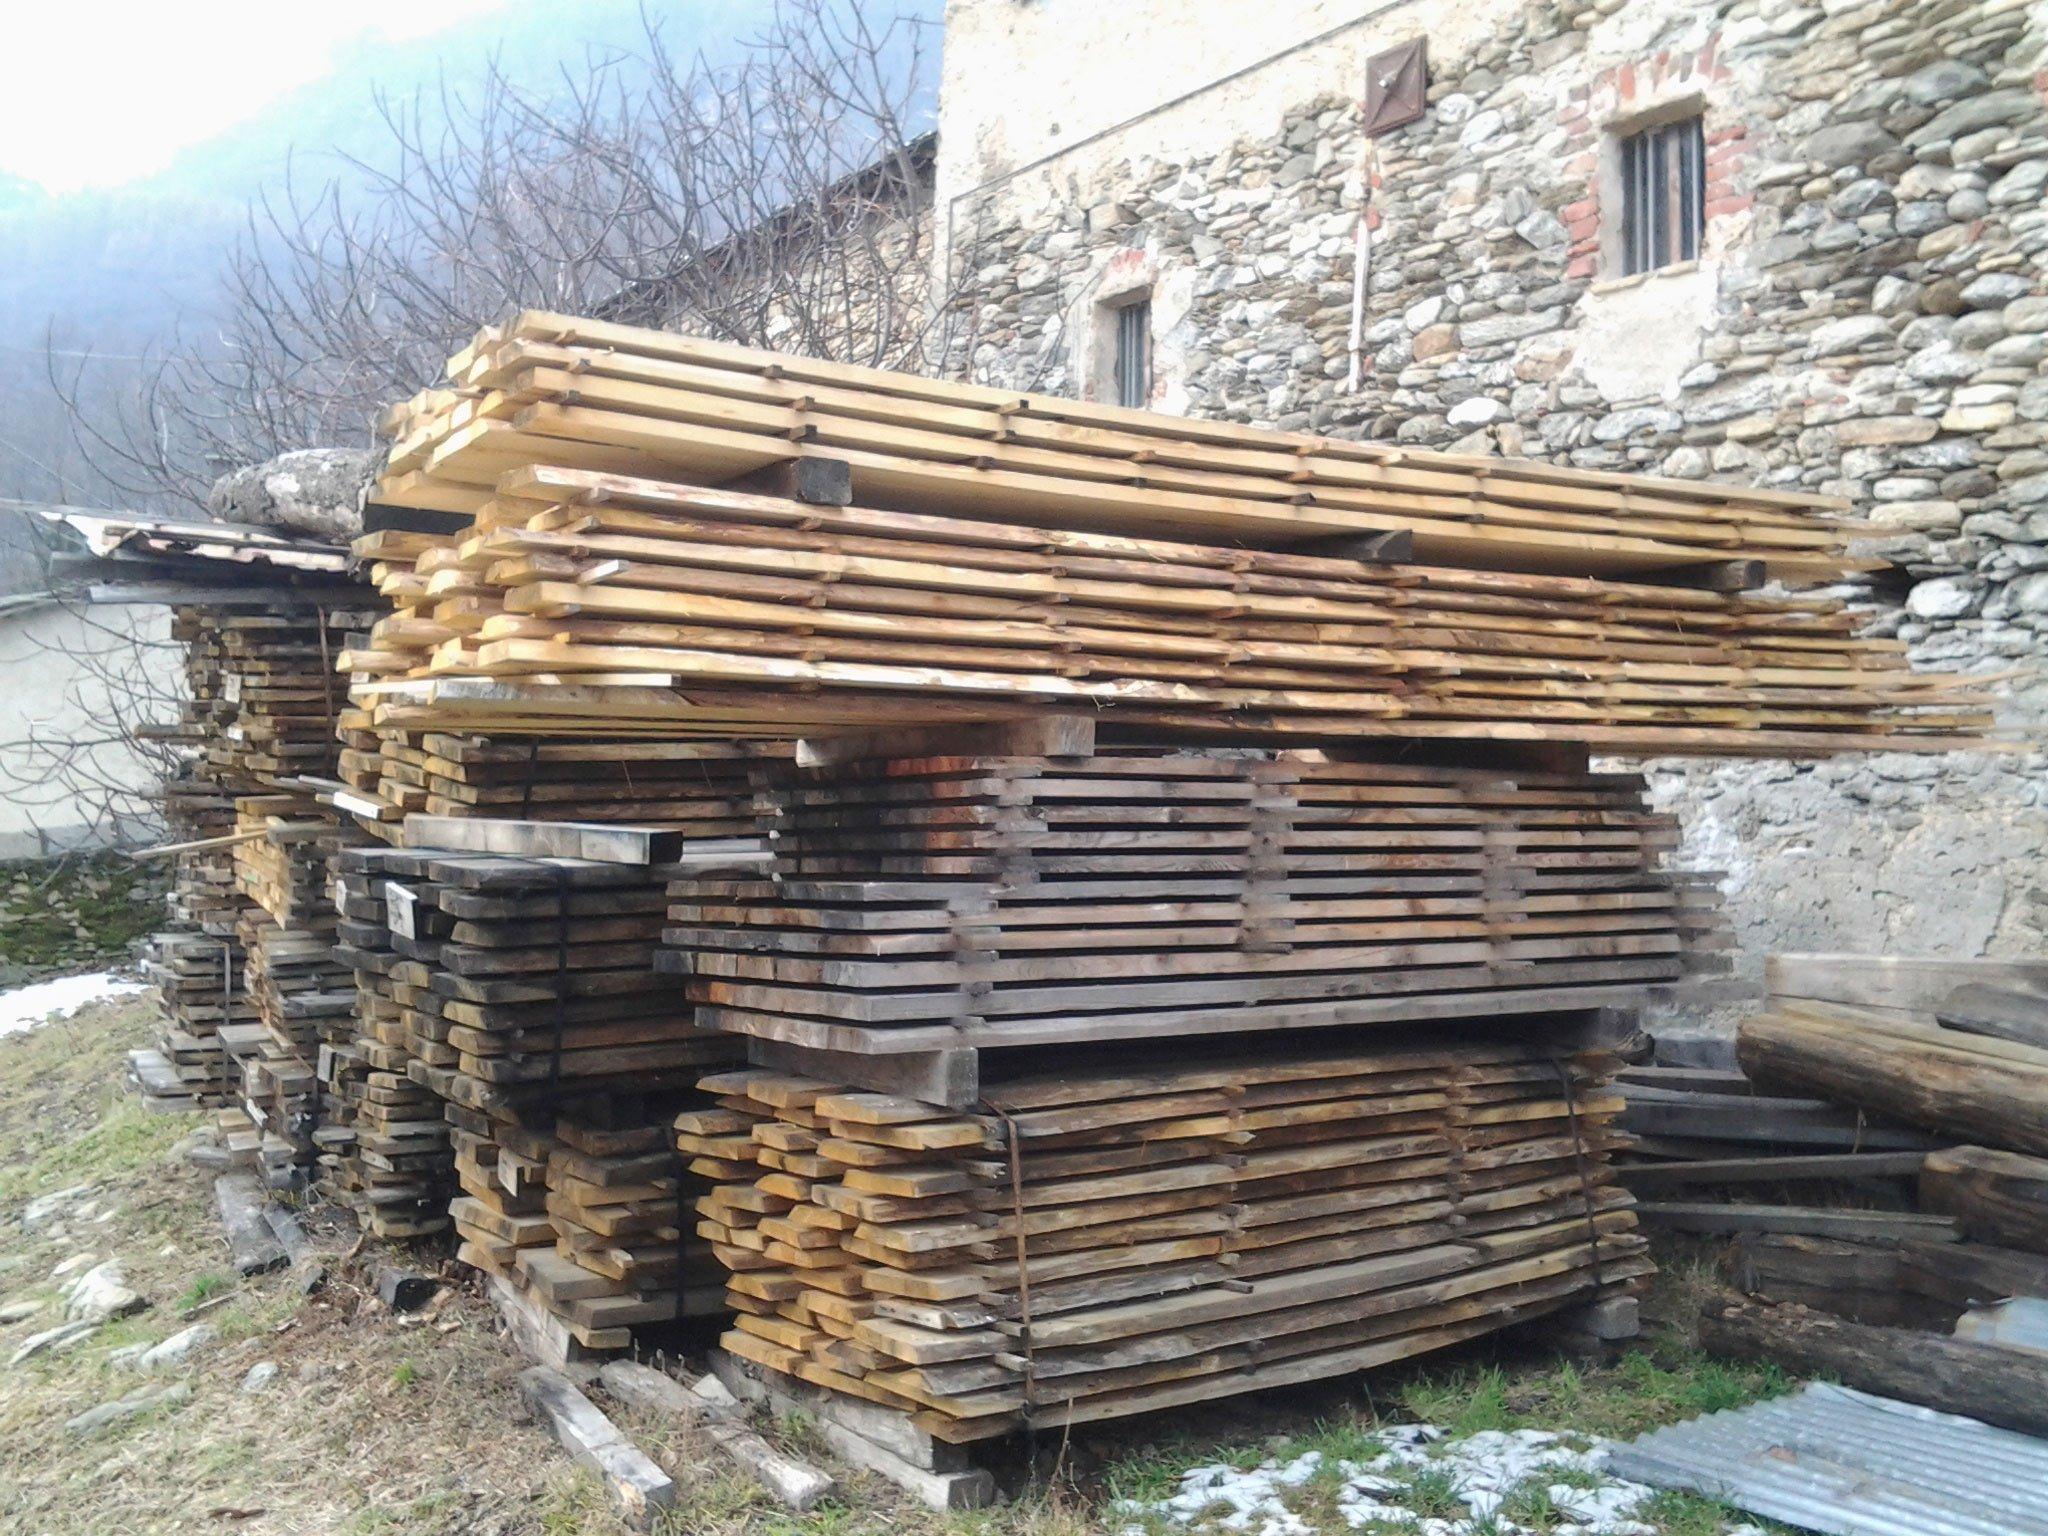 un insieme di legna tagliata vicino a una costruzione in pietra